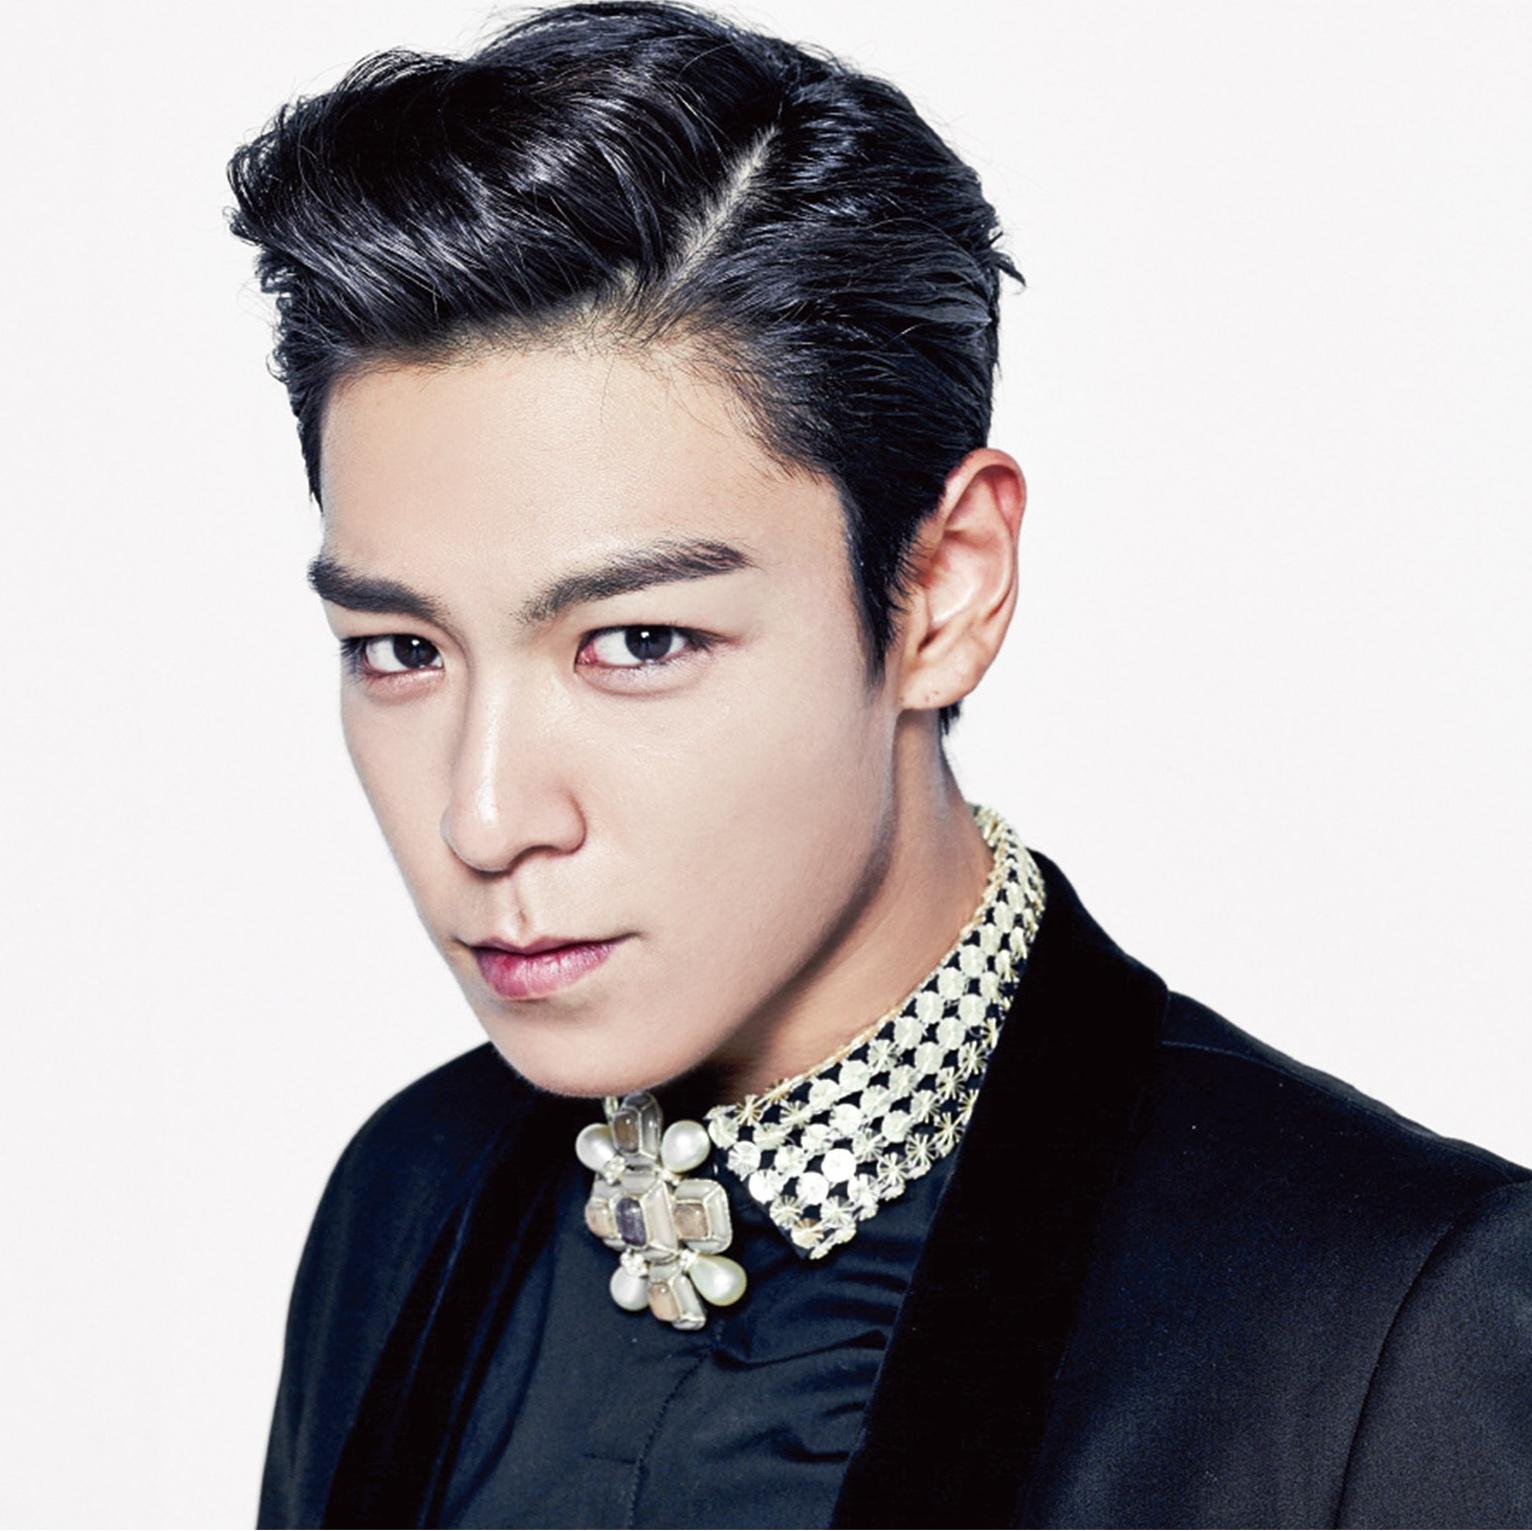 T.O.P Des BIGBANG S'est Enfin Réveillé